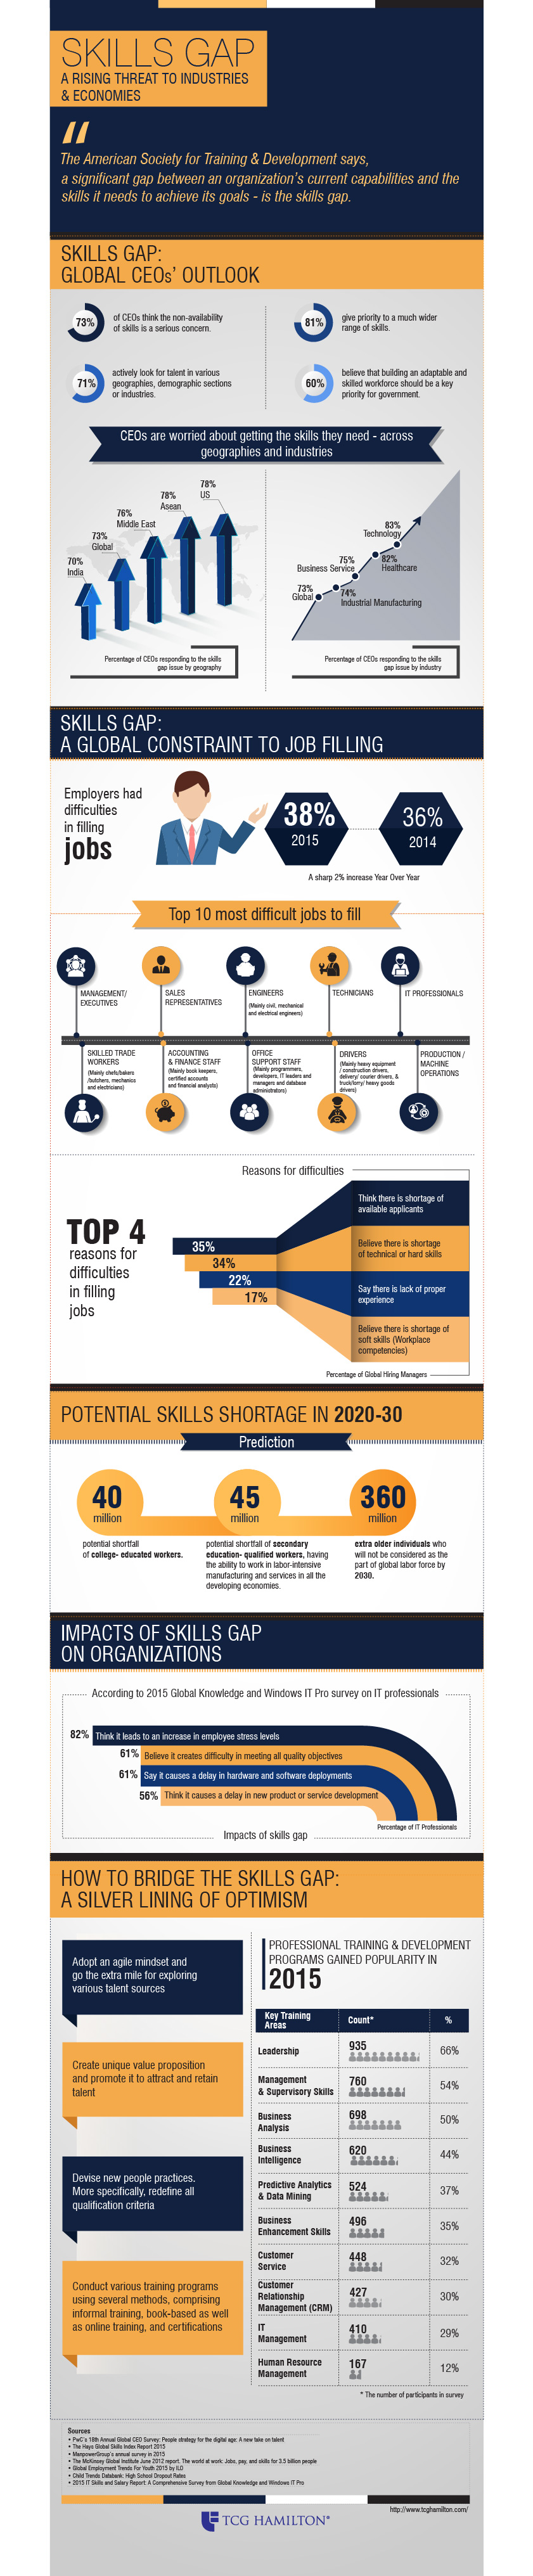 Skills Gap - A Rising Threat to Industries & Economies